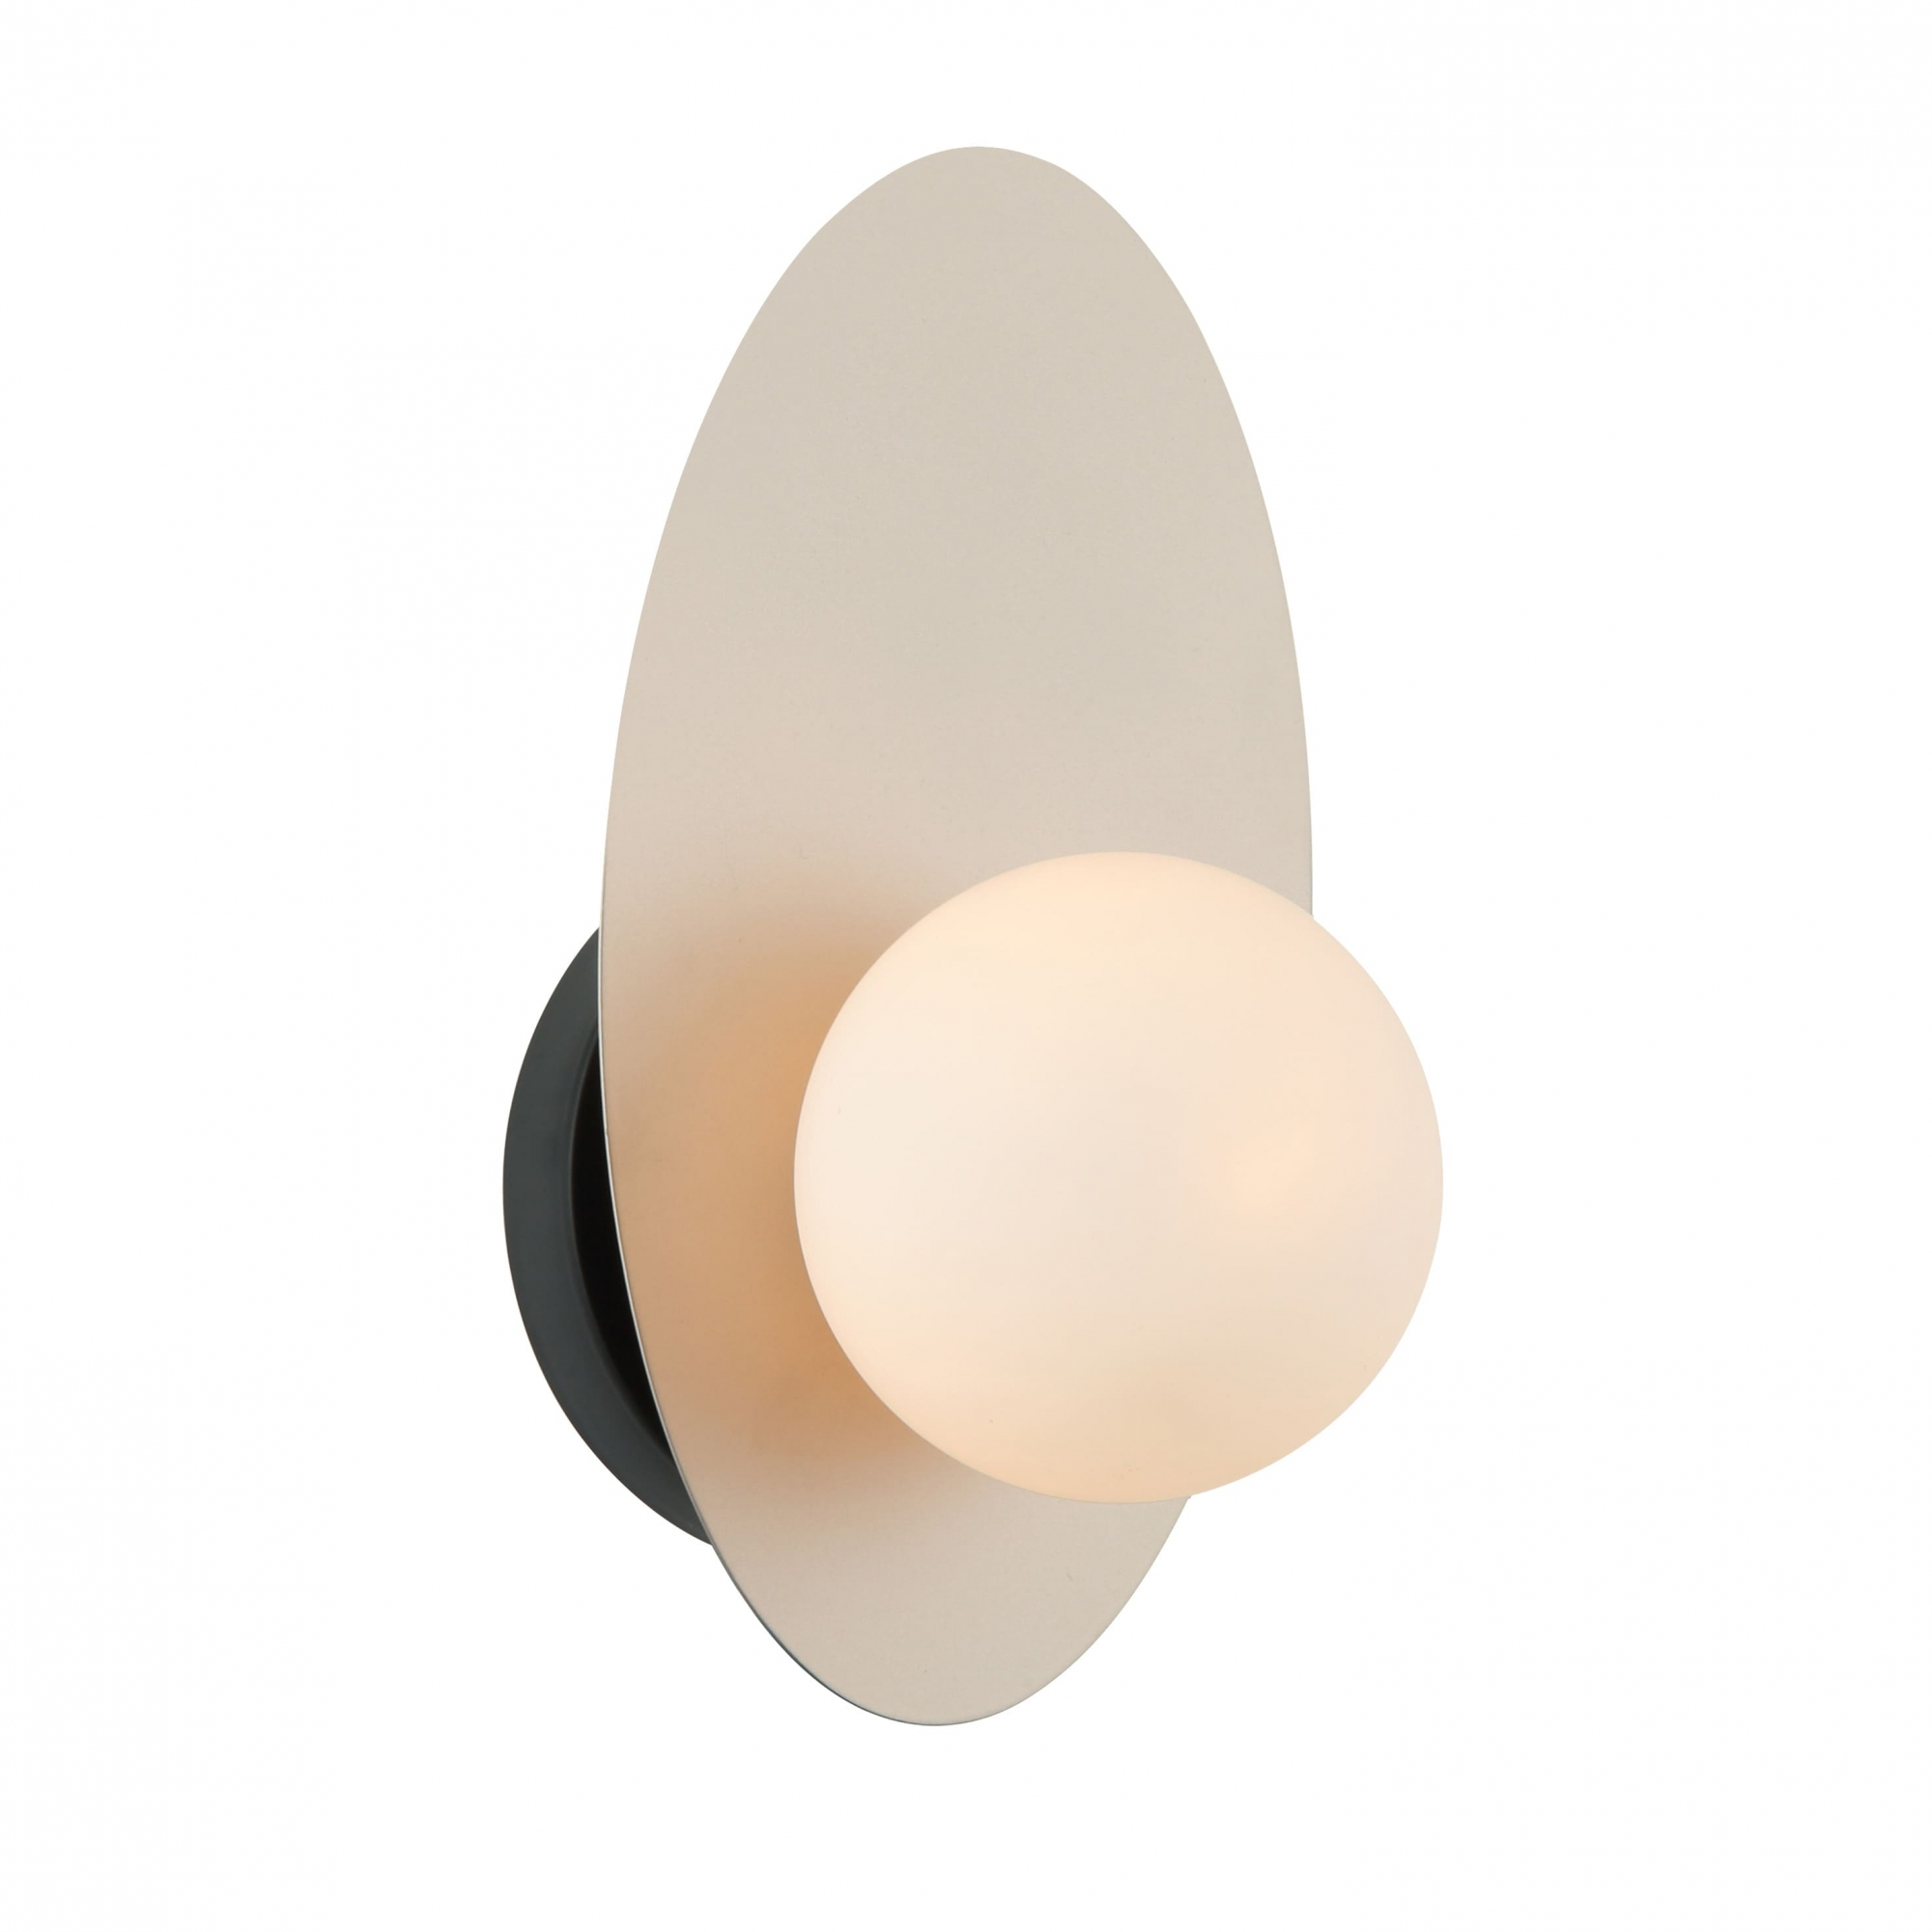 Arandela Ibira Nude Preto e Branco 14x13x25cm 1xG9 25W Bivolt Bella Iluminação HL015